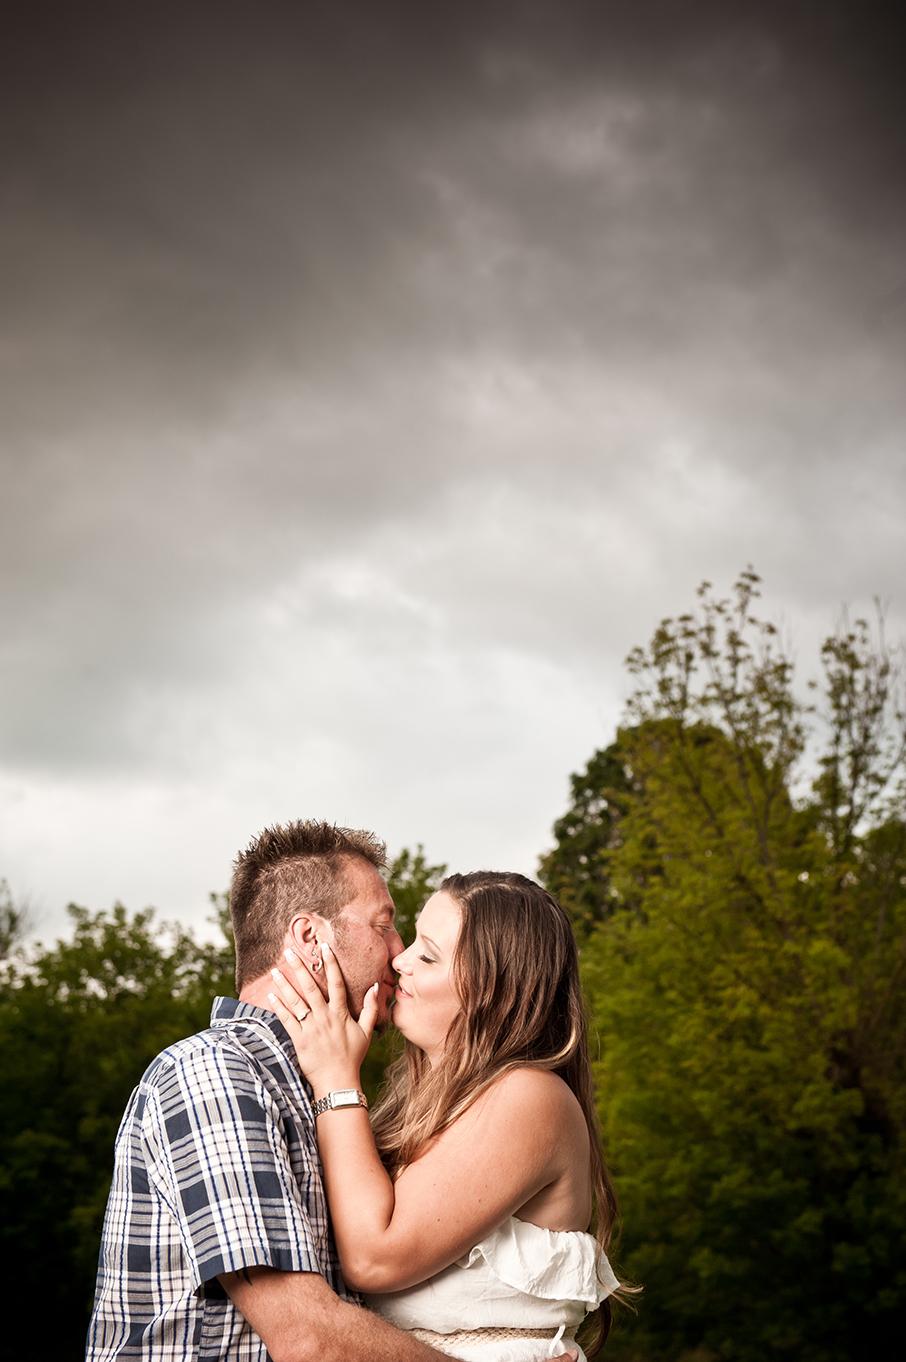 Amanda&Carlo_Engagement-197.jpg